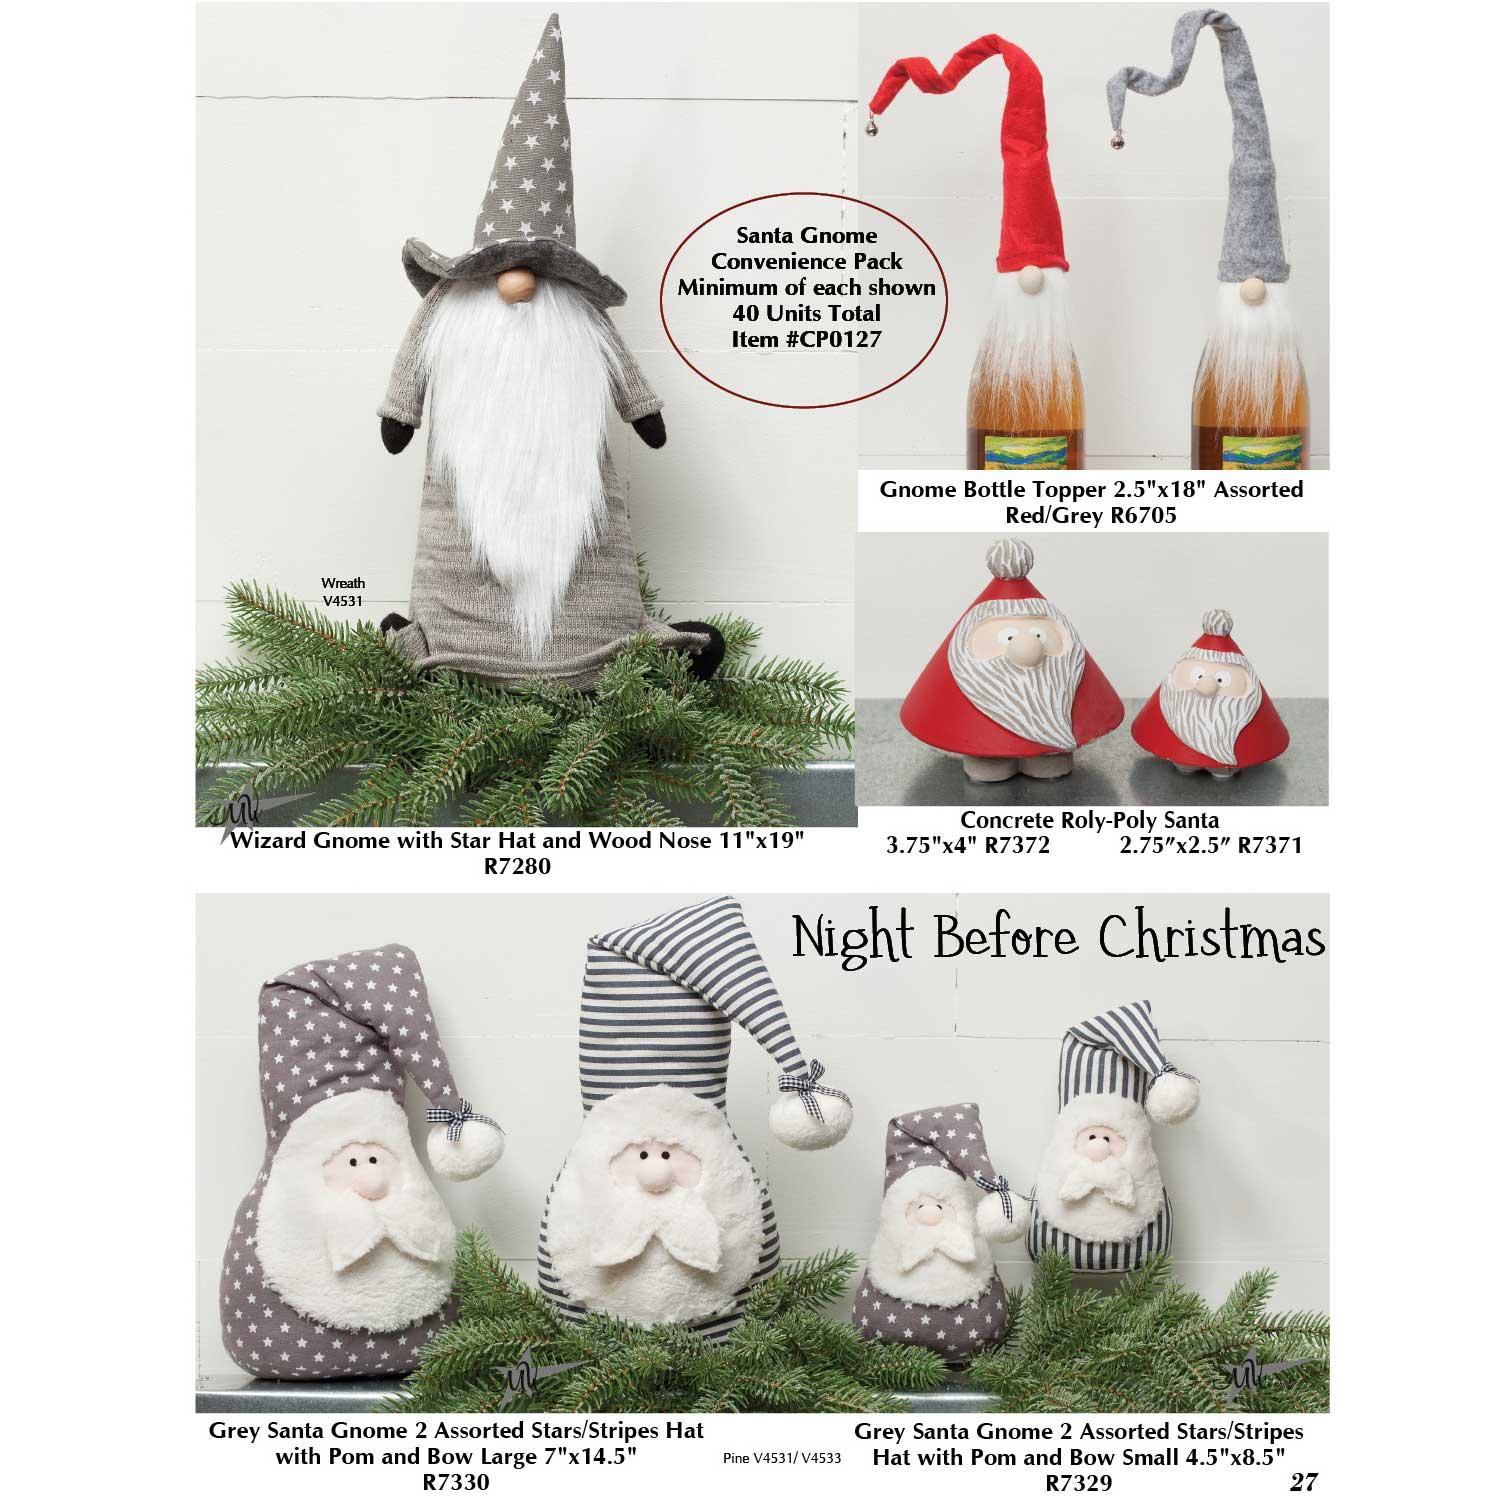 Santa Gnome Convenience Pack